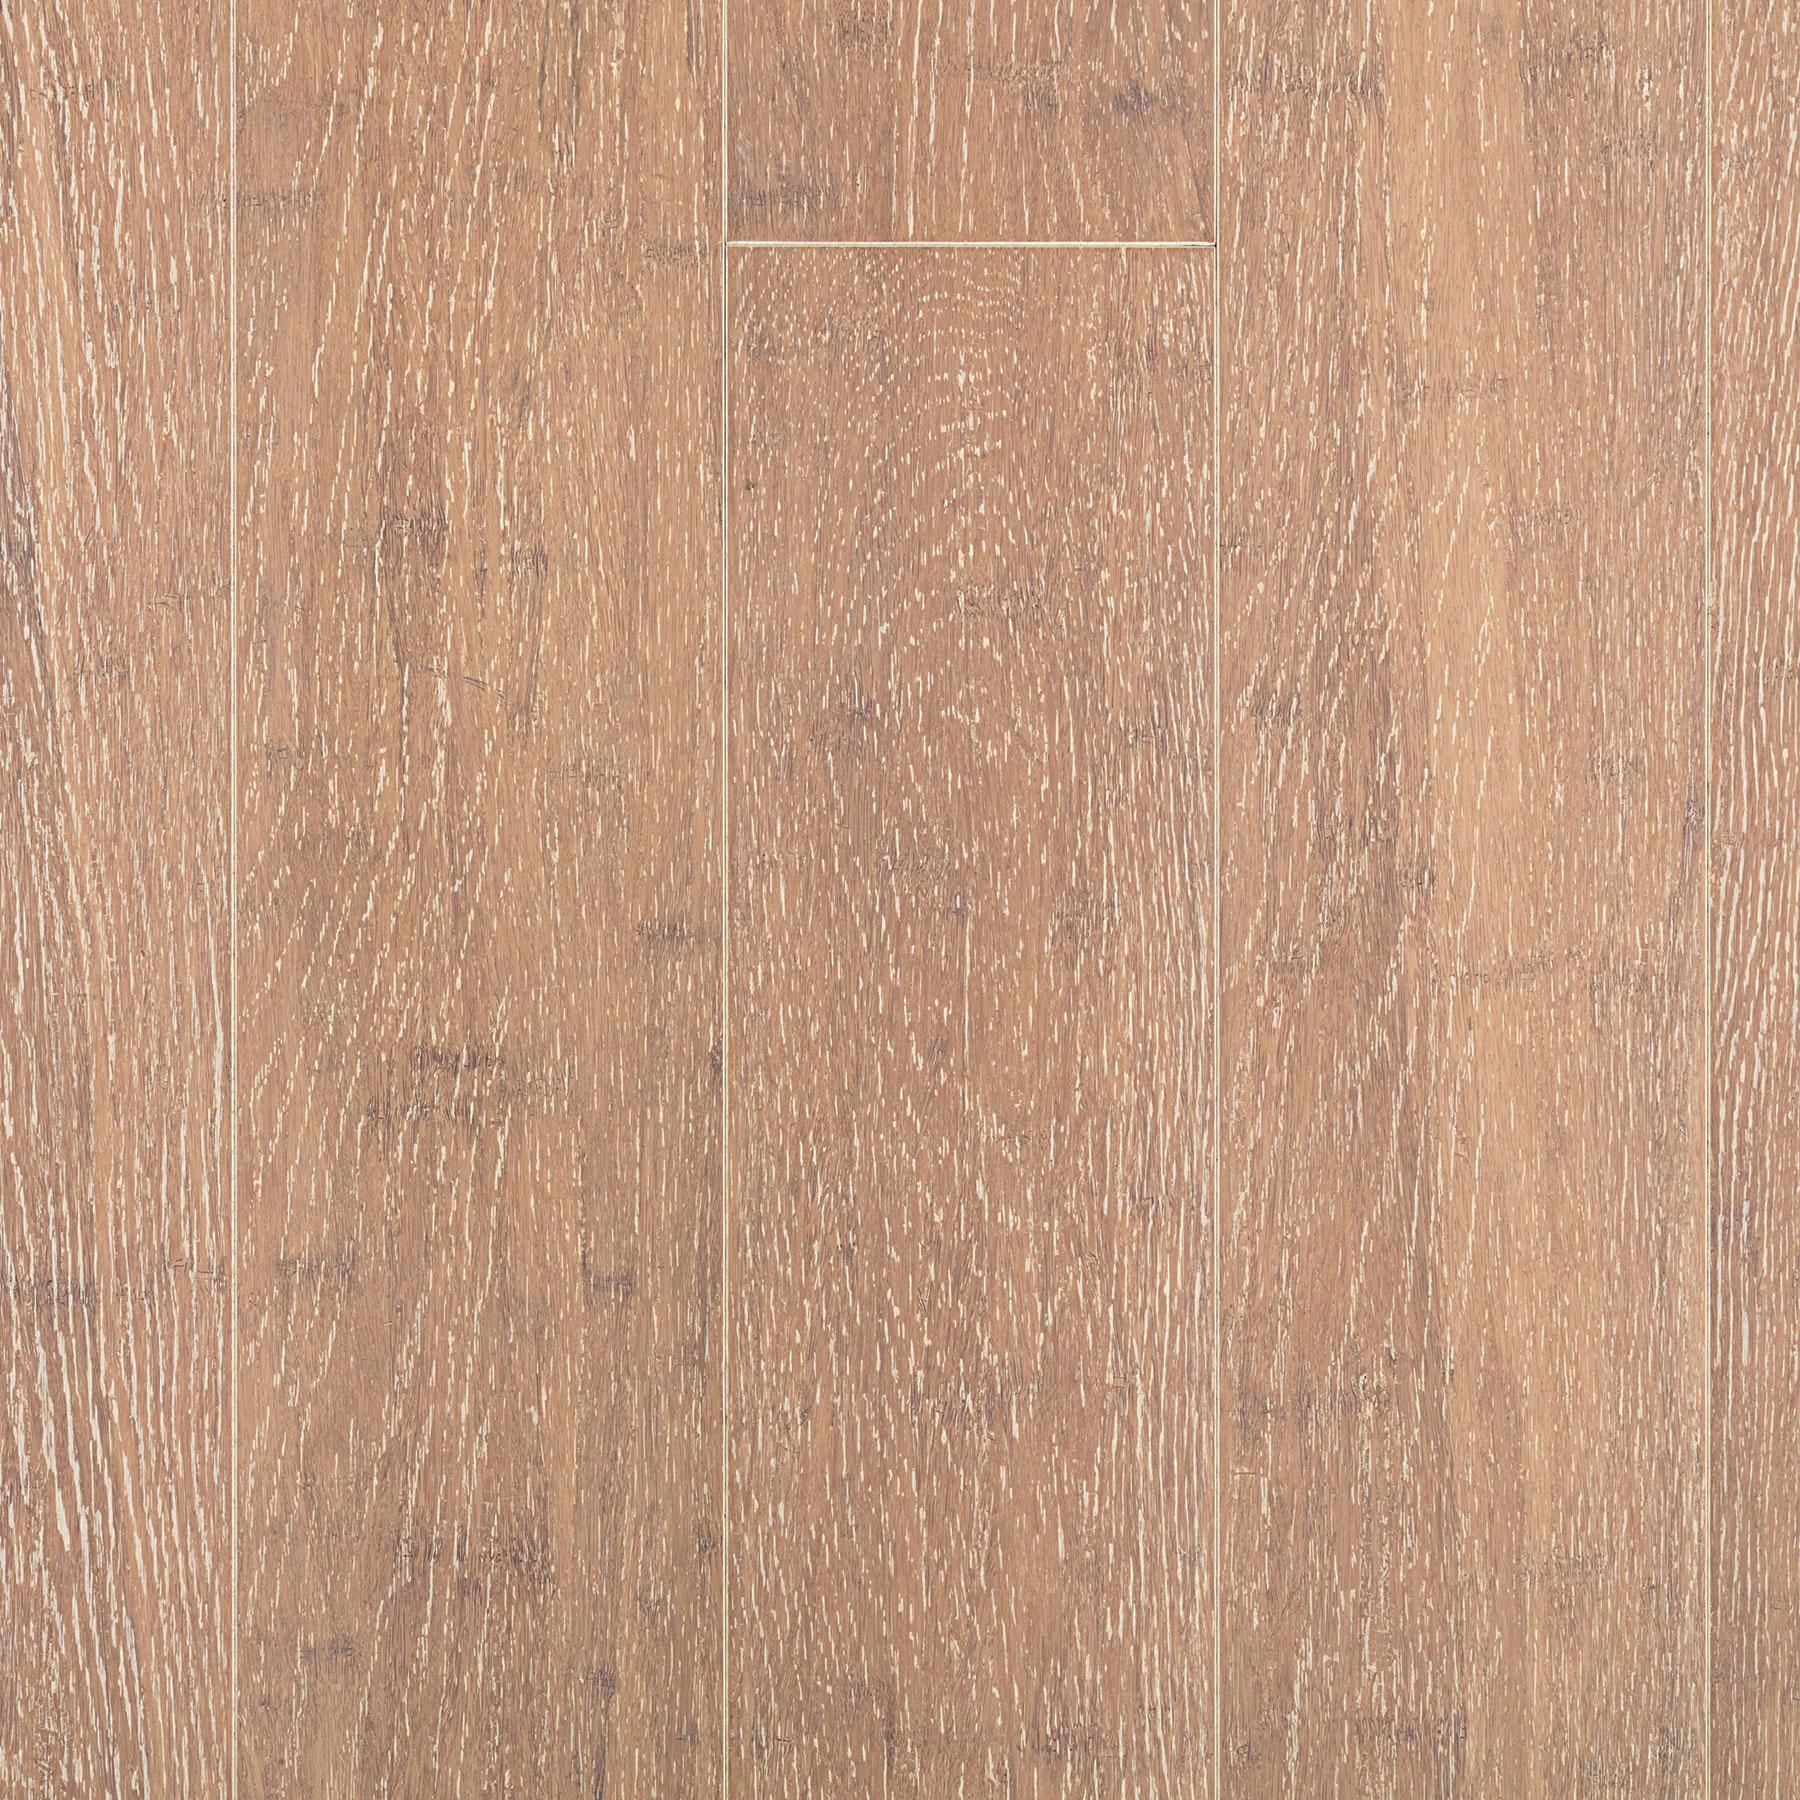 flooring woven the strand bamboo wood l depot home floor team